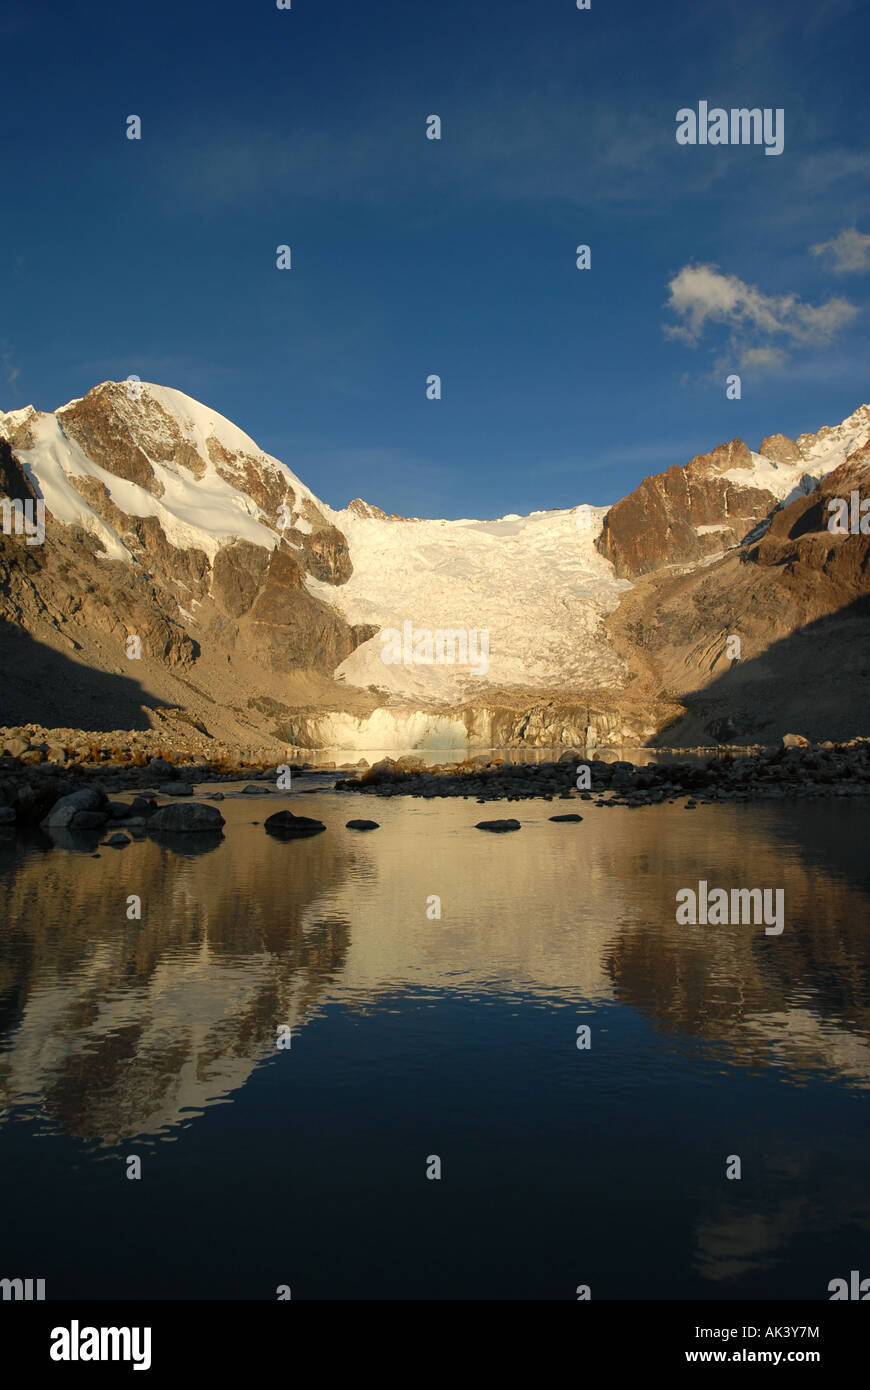 The Lagunas Glaciar is located below Mount Illampu at 5,038 meters outside of Sorata, Bolivia, South America. - Stock Image